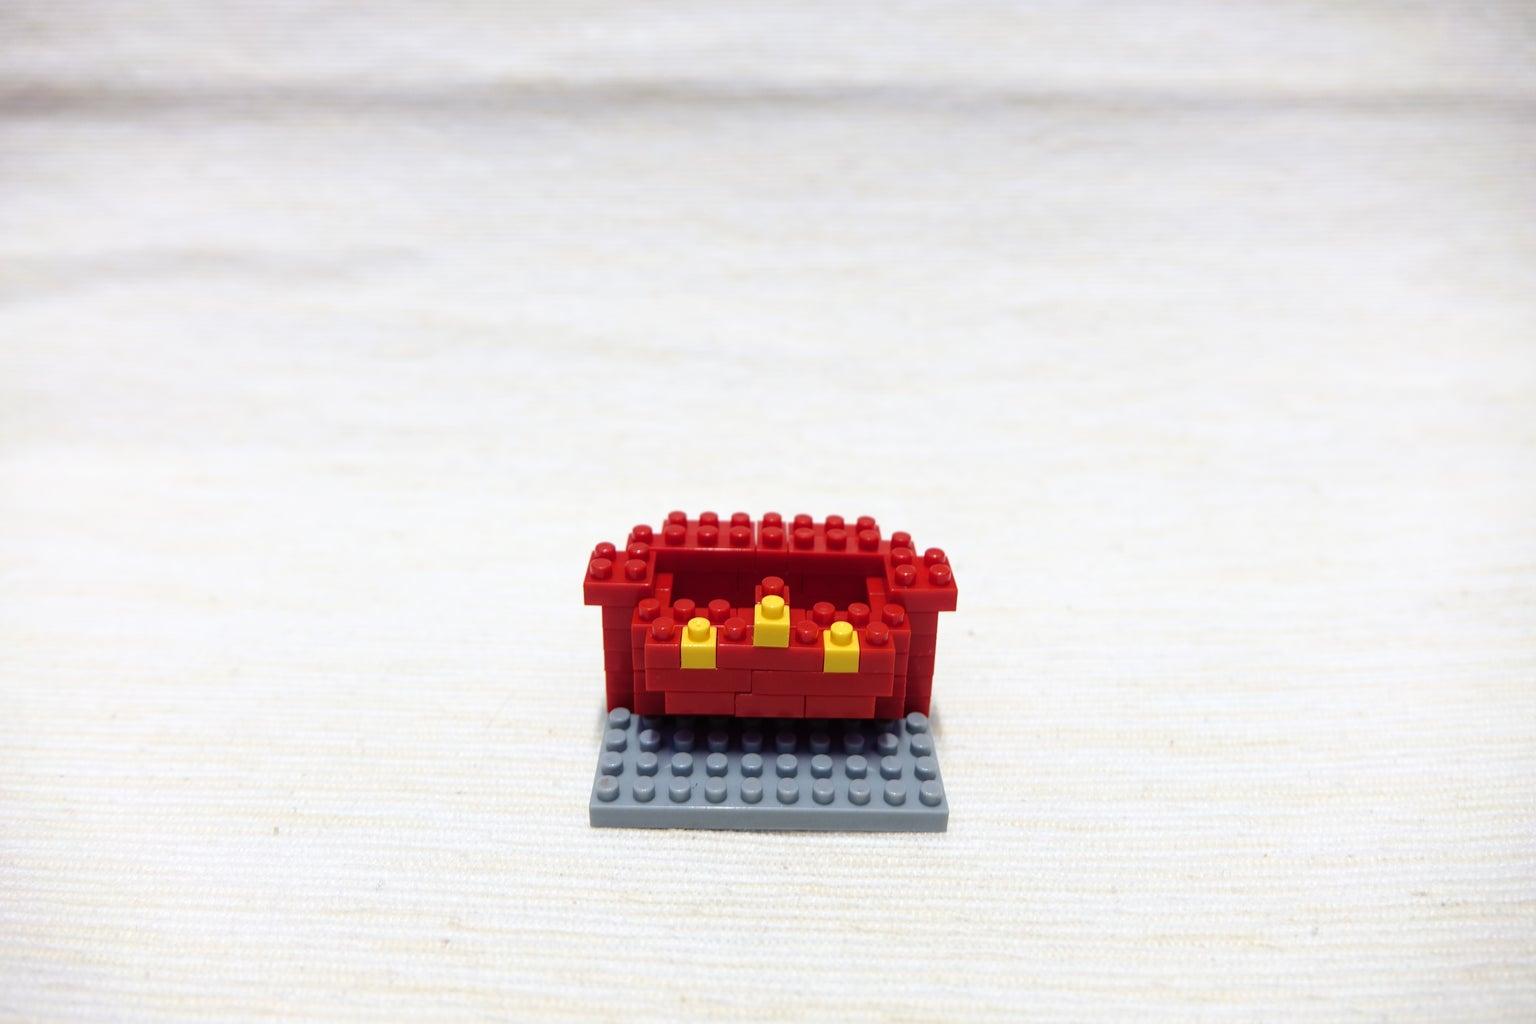 Red Block 1*1, Yellow Block 1*1